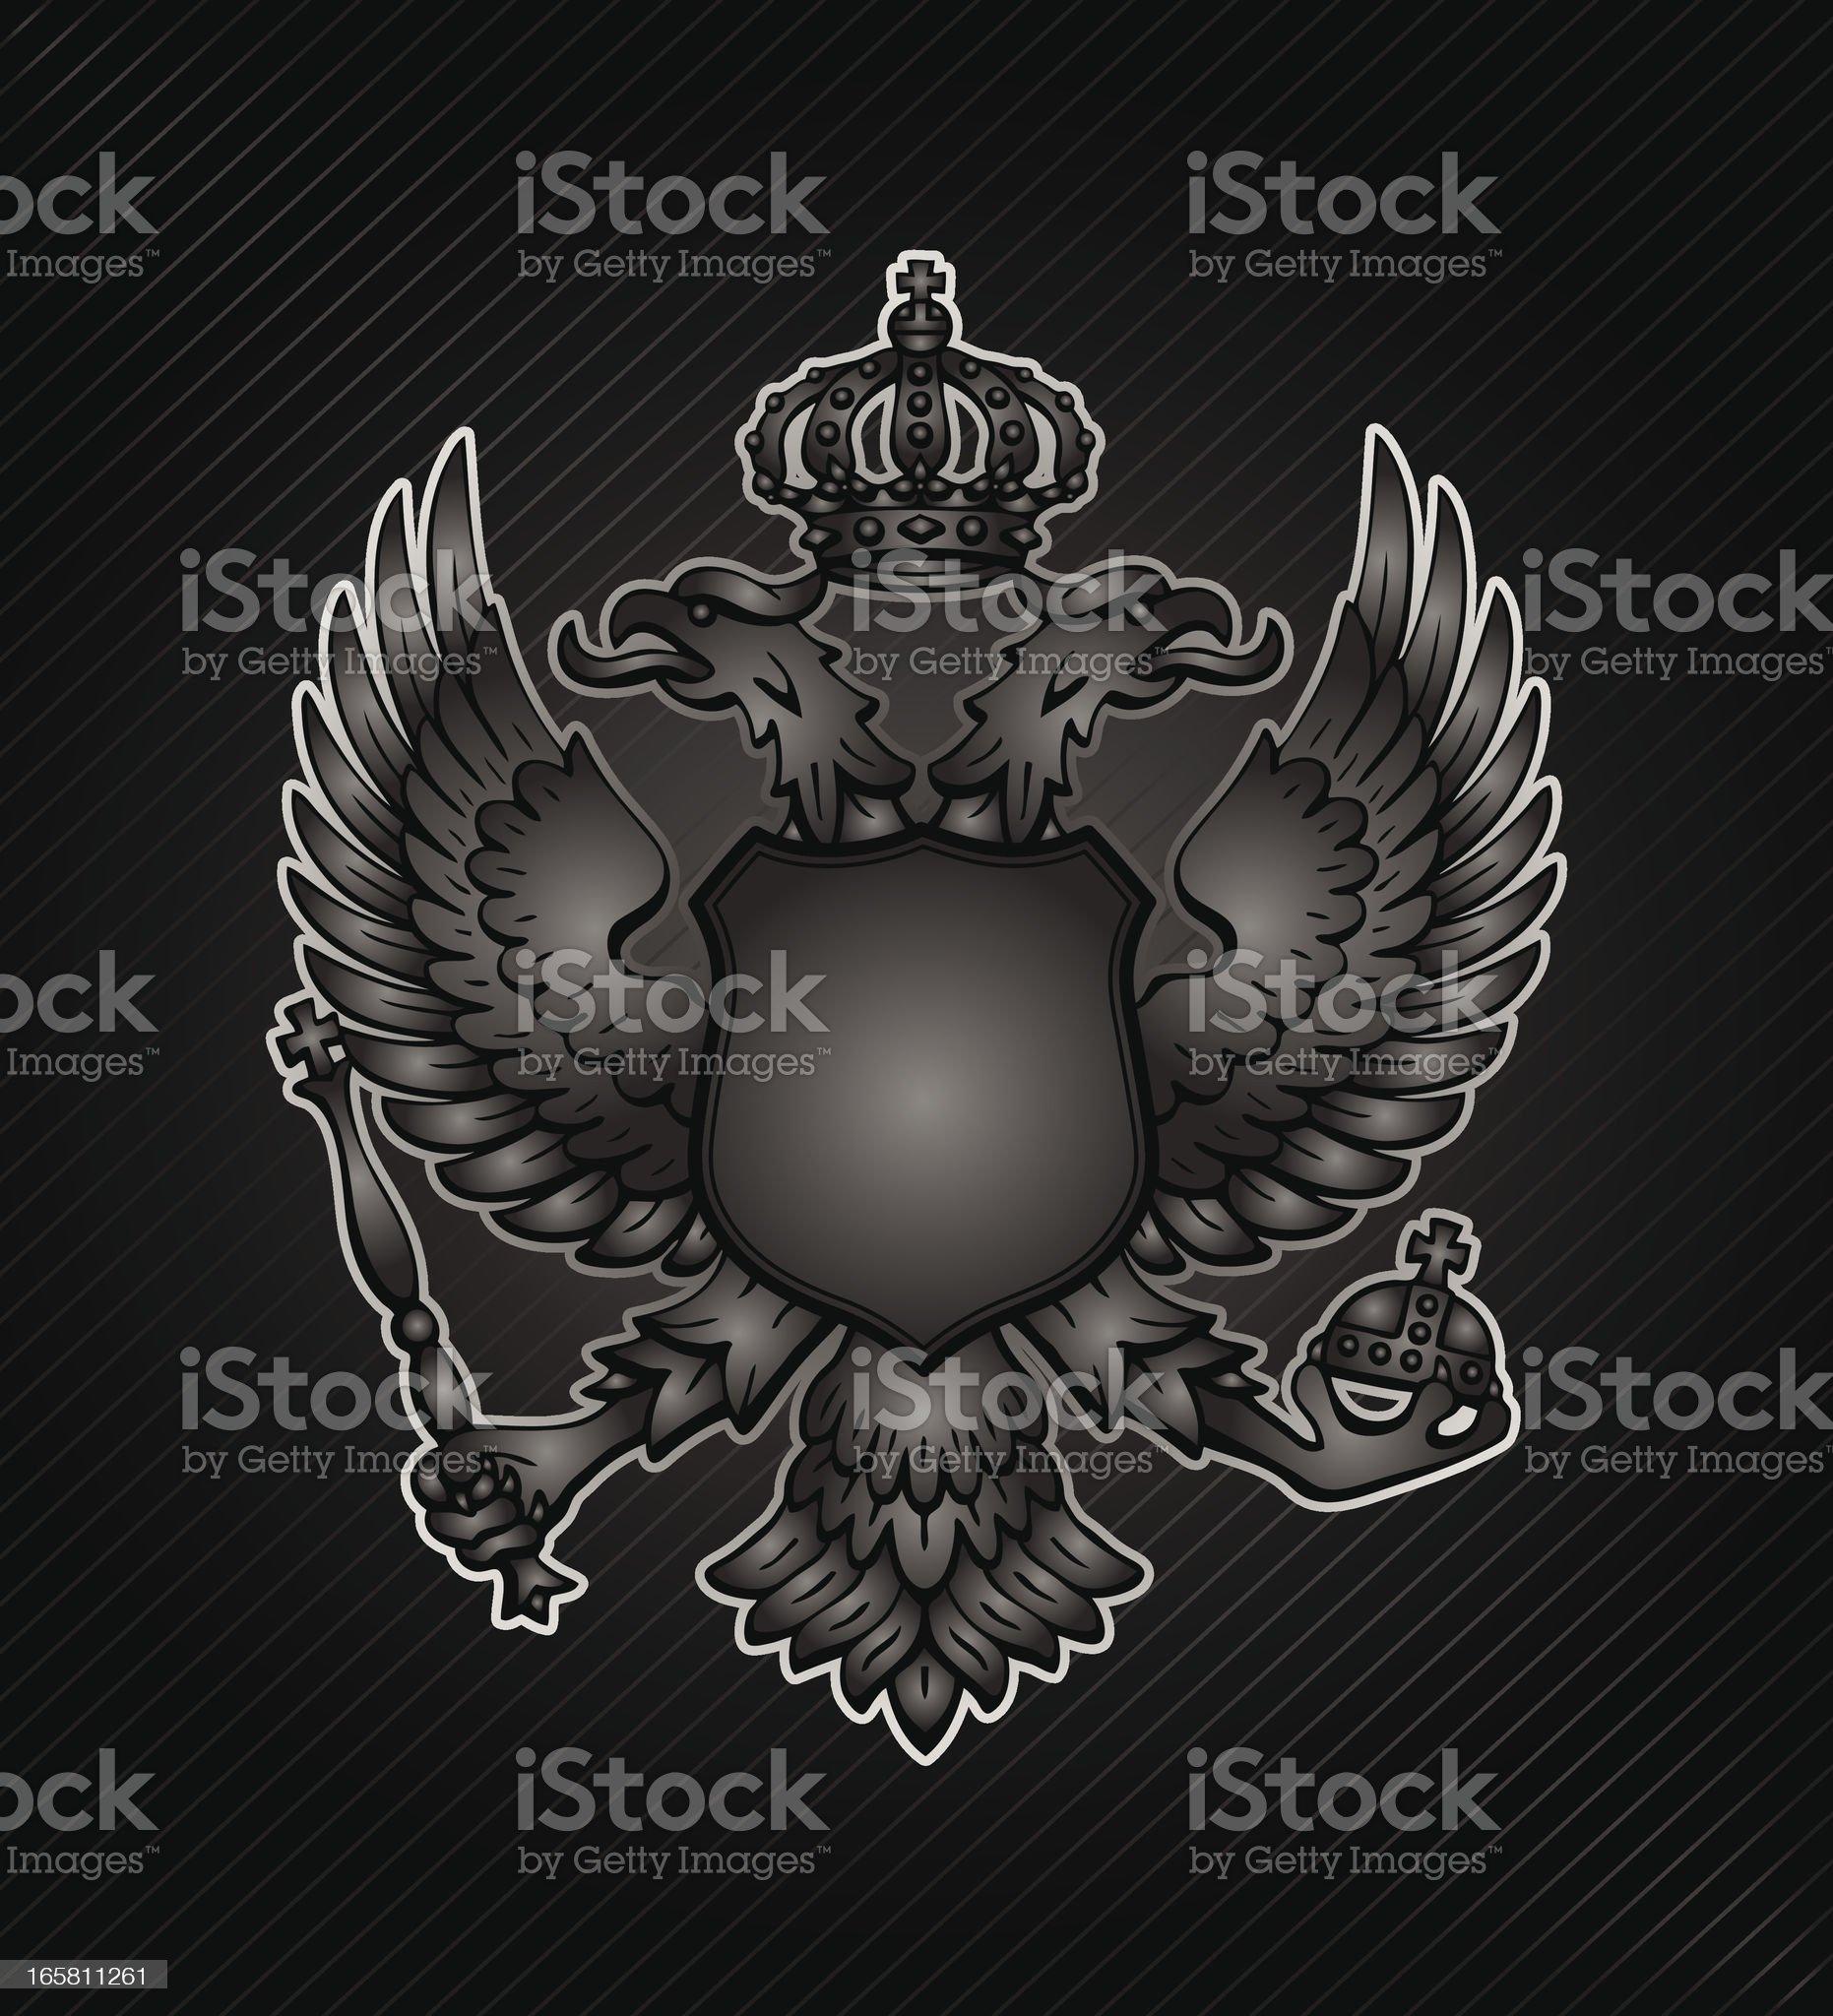 Heraldic Seal royalty-free stock vector art